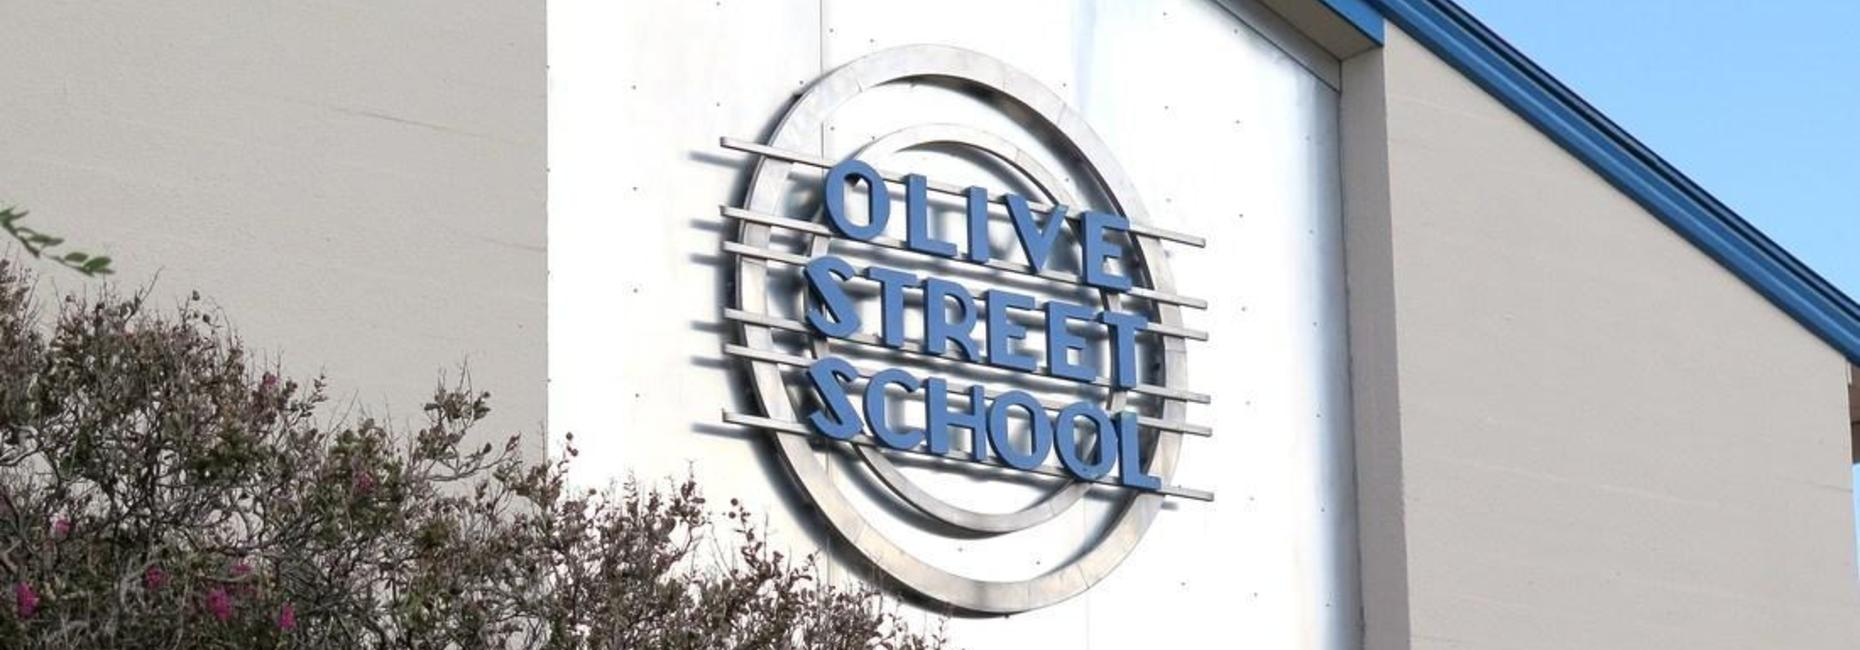 Olive Street